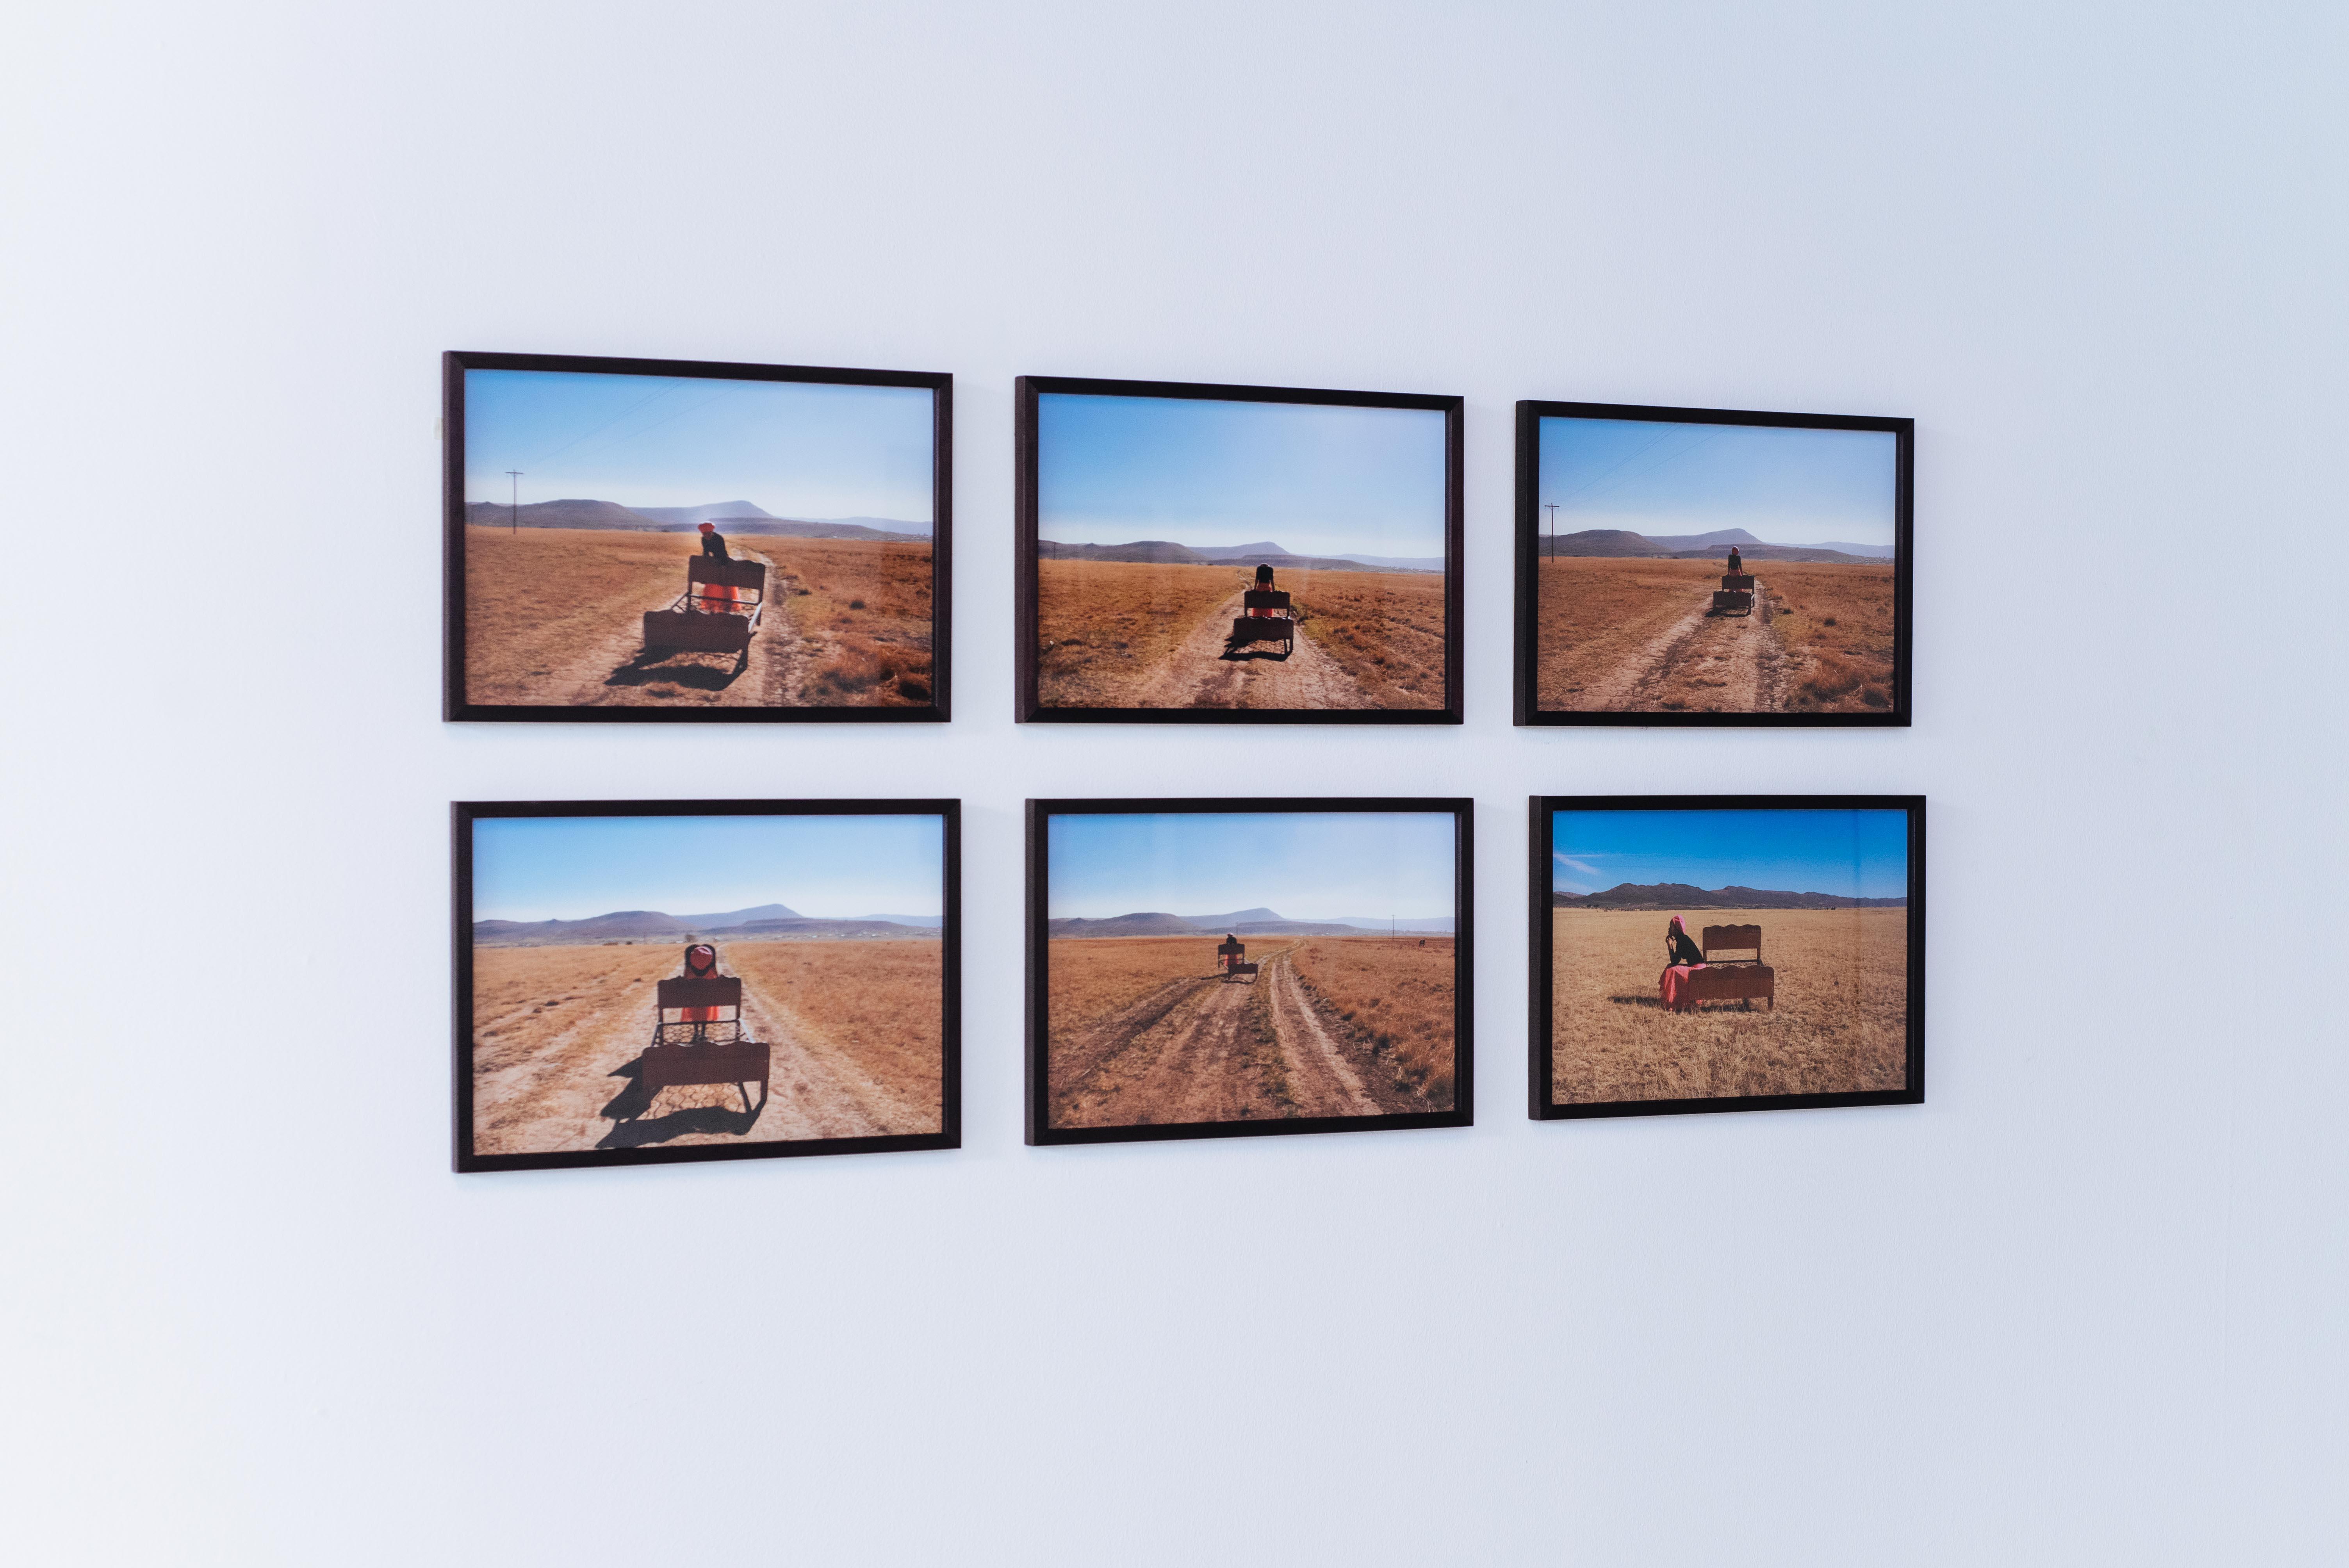 Exhibition of Thandiwe Msebenzi's photography at SMITH Gallery